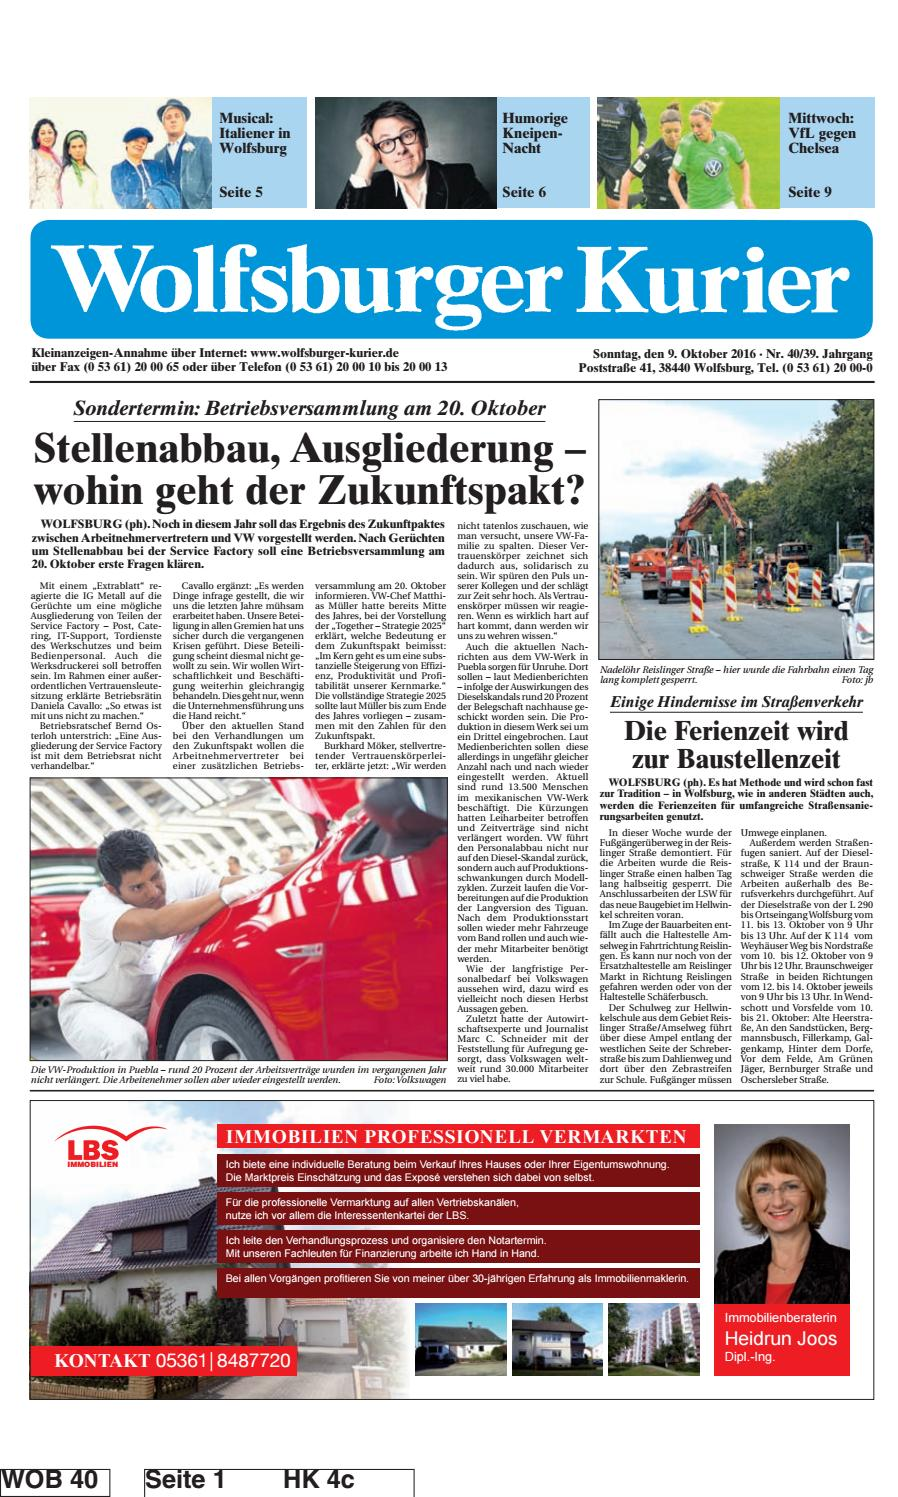 2016 10 09 by wolfsburger kurier - issuu, Hause ideen